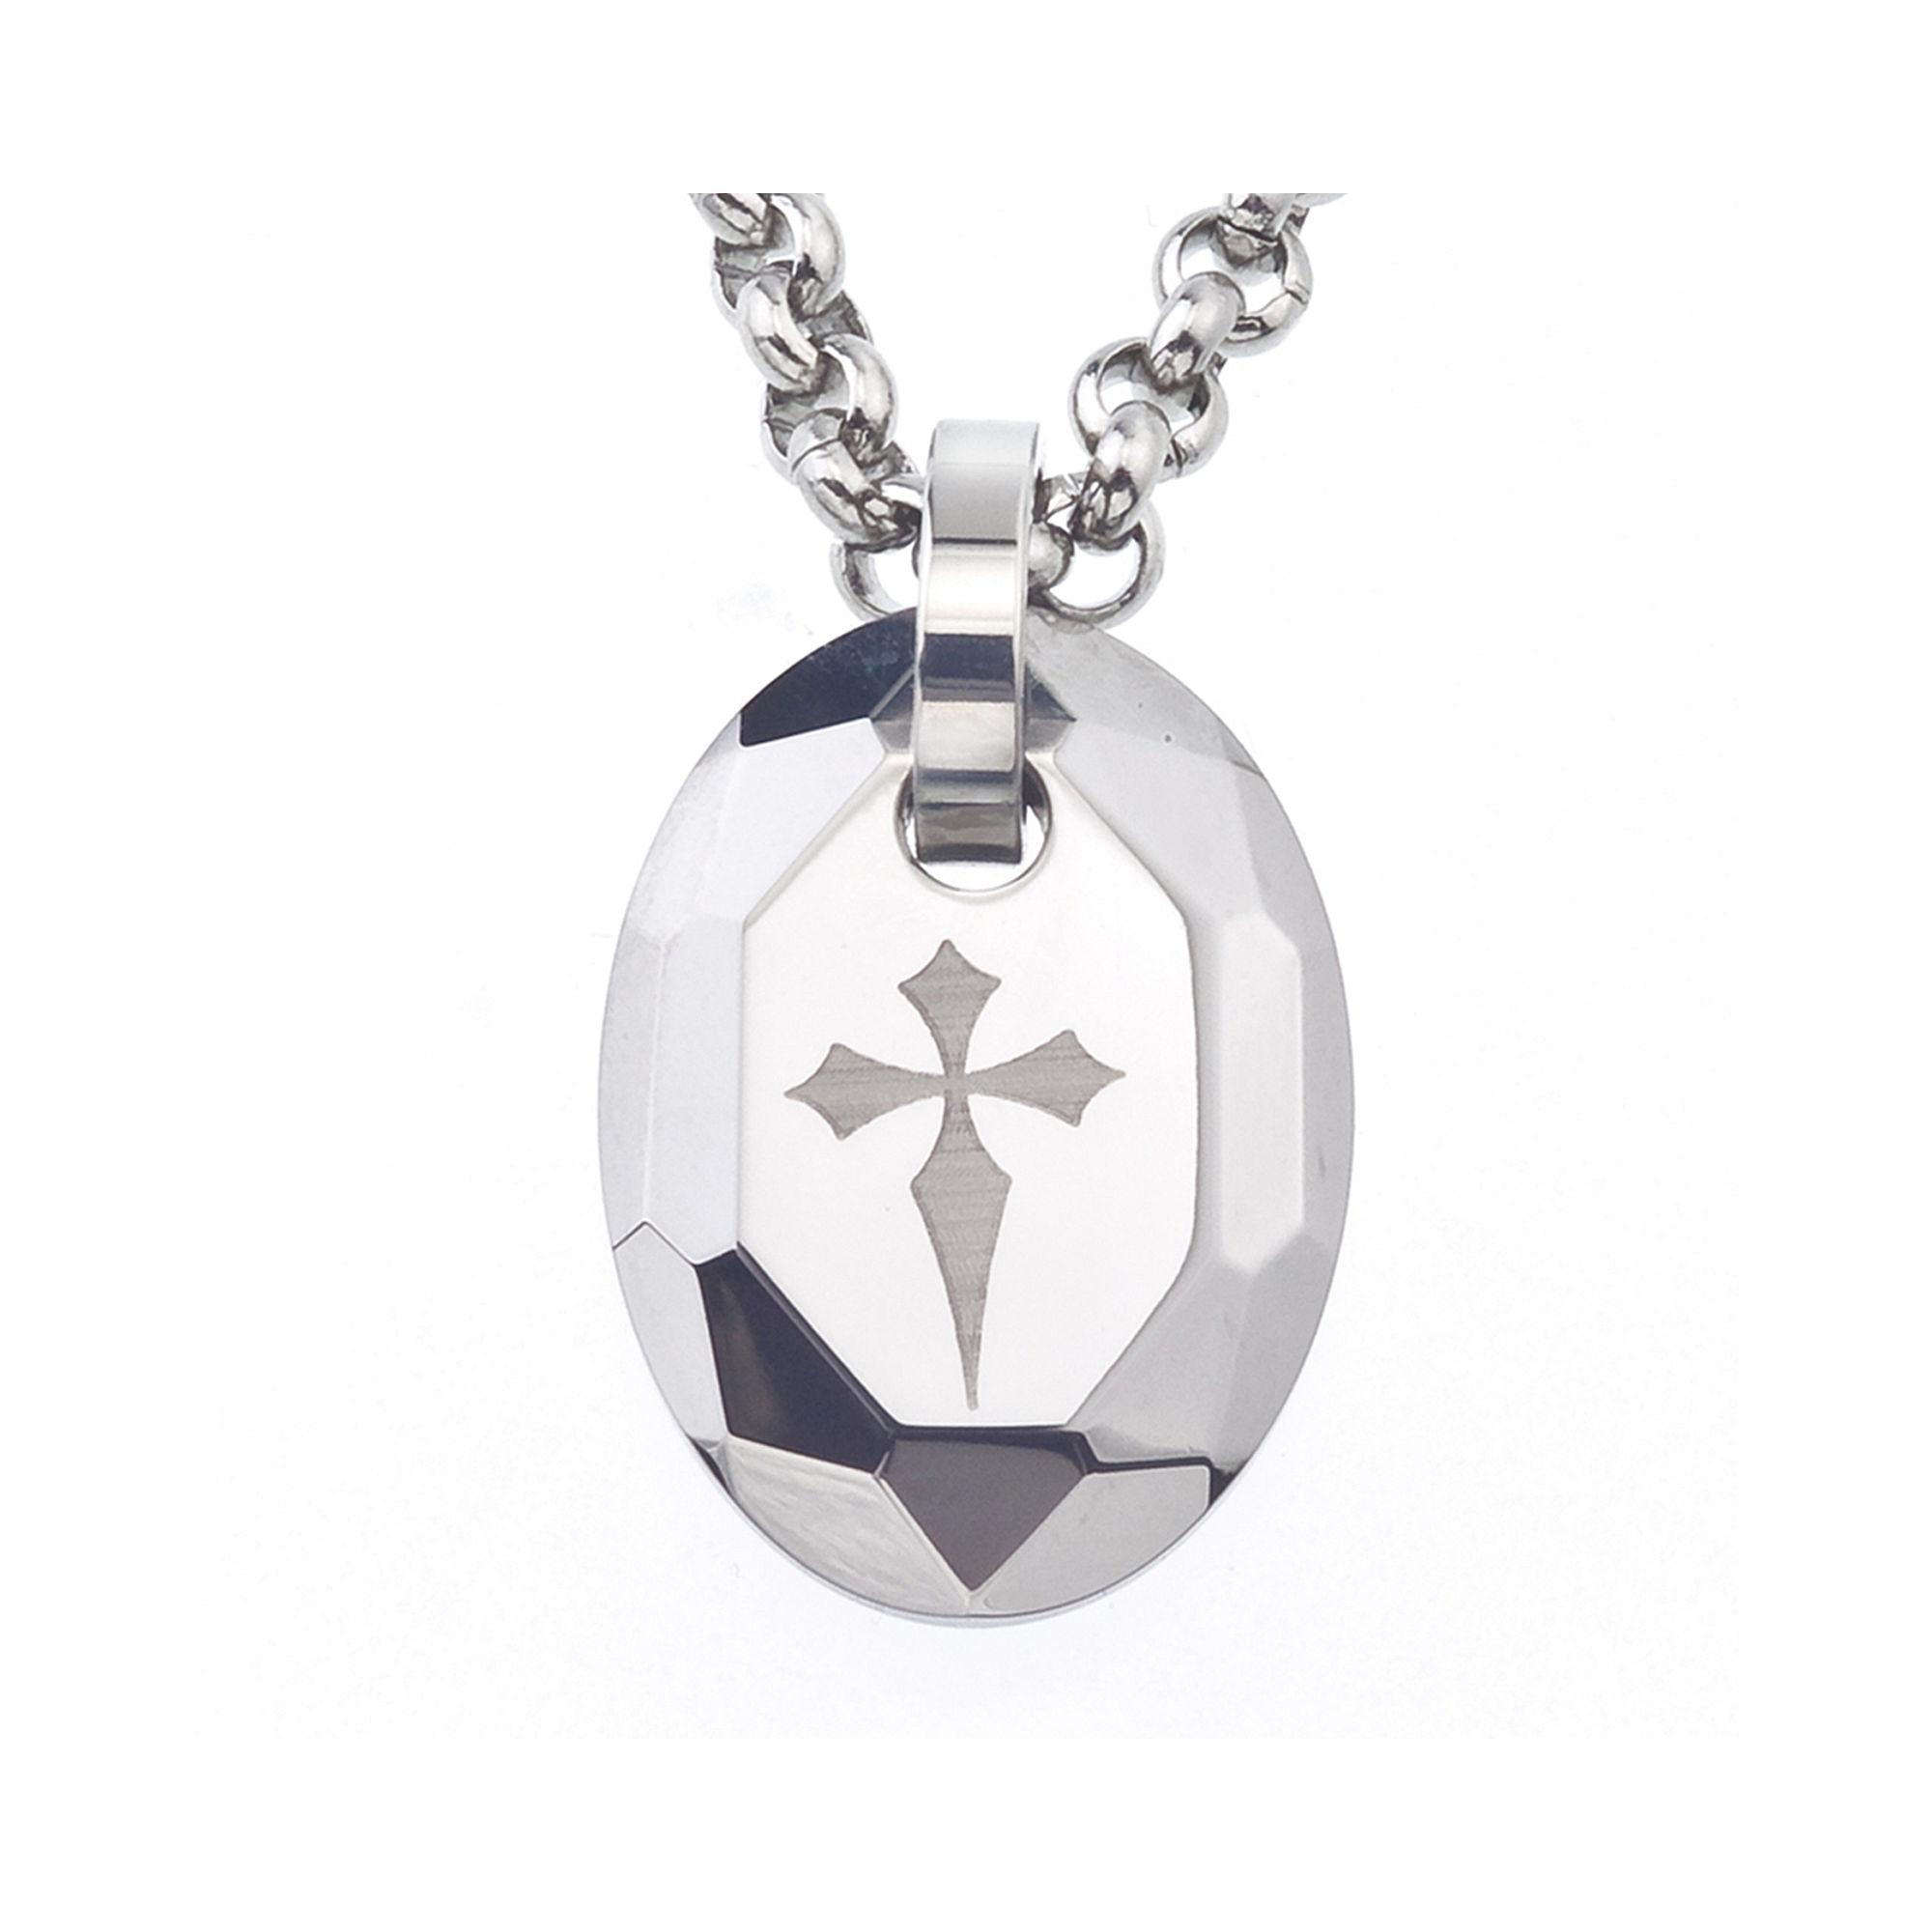 Mens Tungsten Cross Pendant Necklace